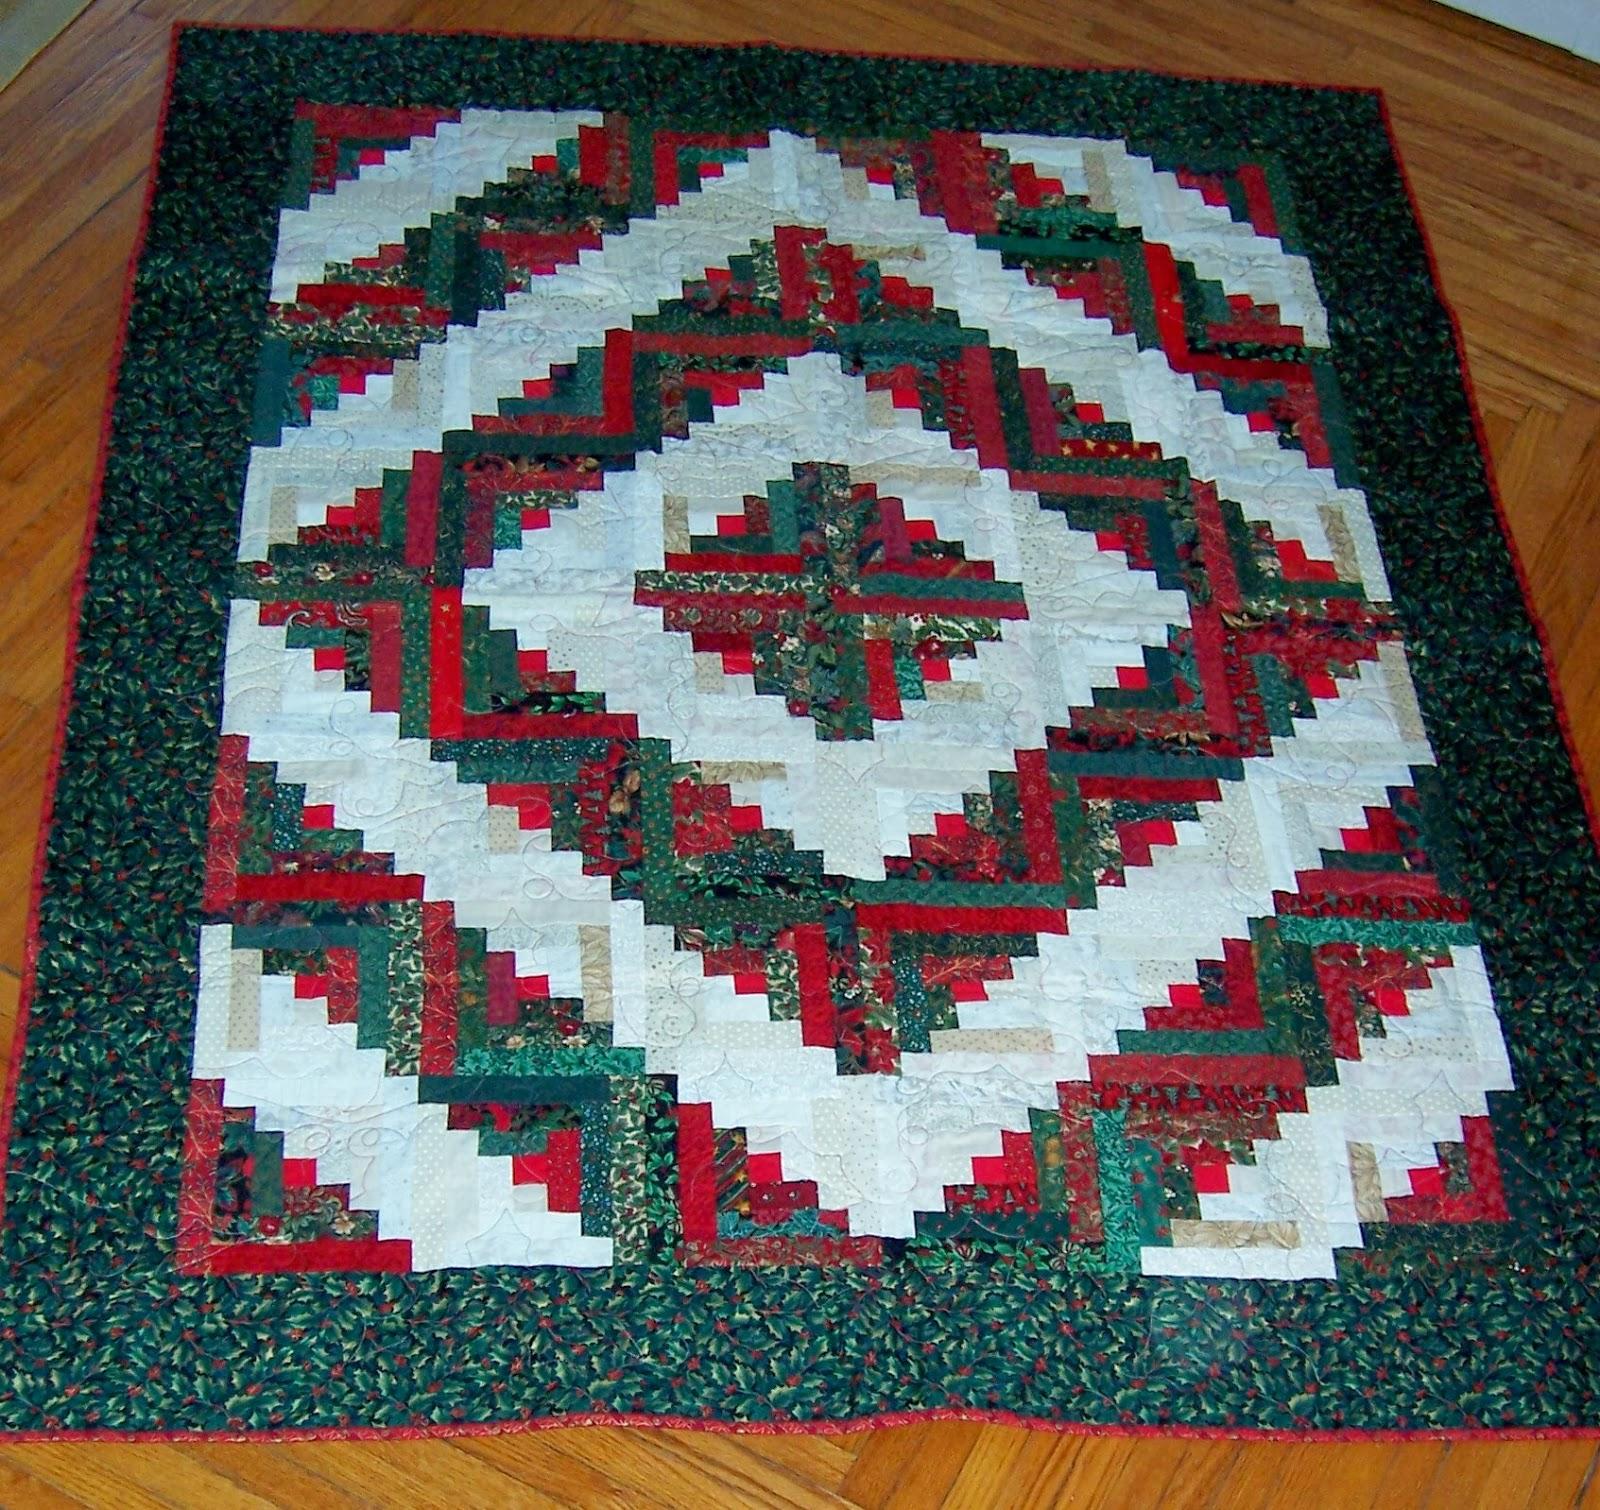 Bachelor 484 sq ft log home kit log cabin kit mountain ridge -  Log Cabin Make A Quilting On Main Street Christmas Quilts Past Part 3